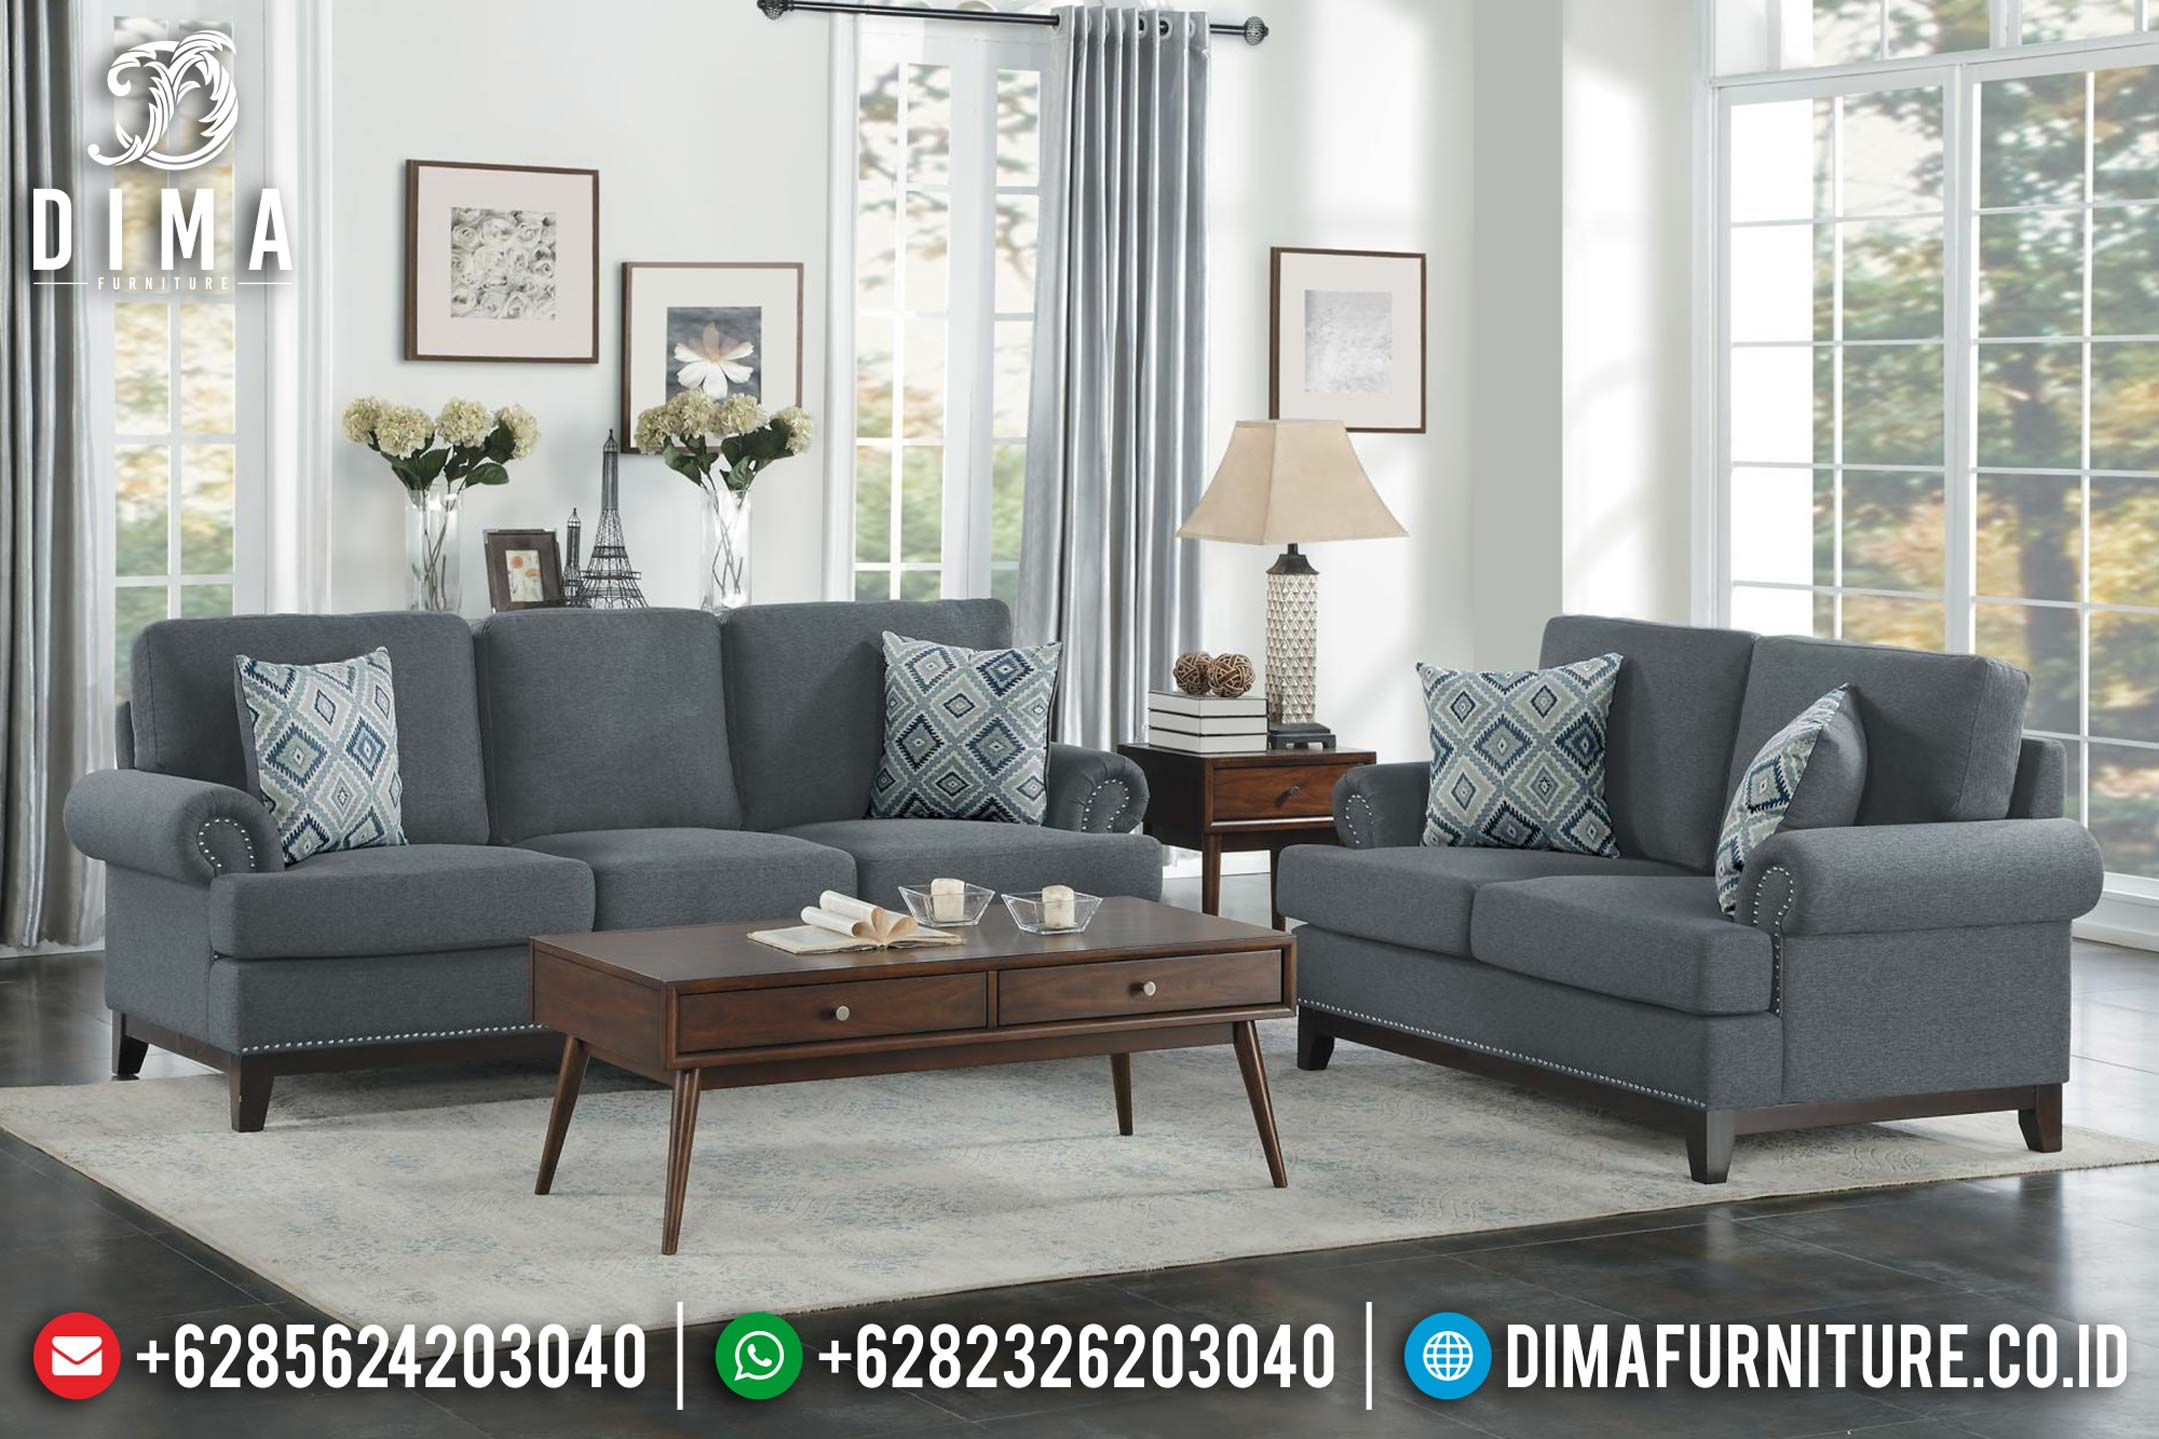 Jual Set Kursi Sofa Tamu Jepara Minimalis Terbaru Retro Vintage BT-0011